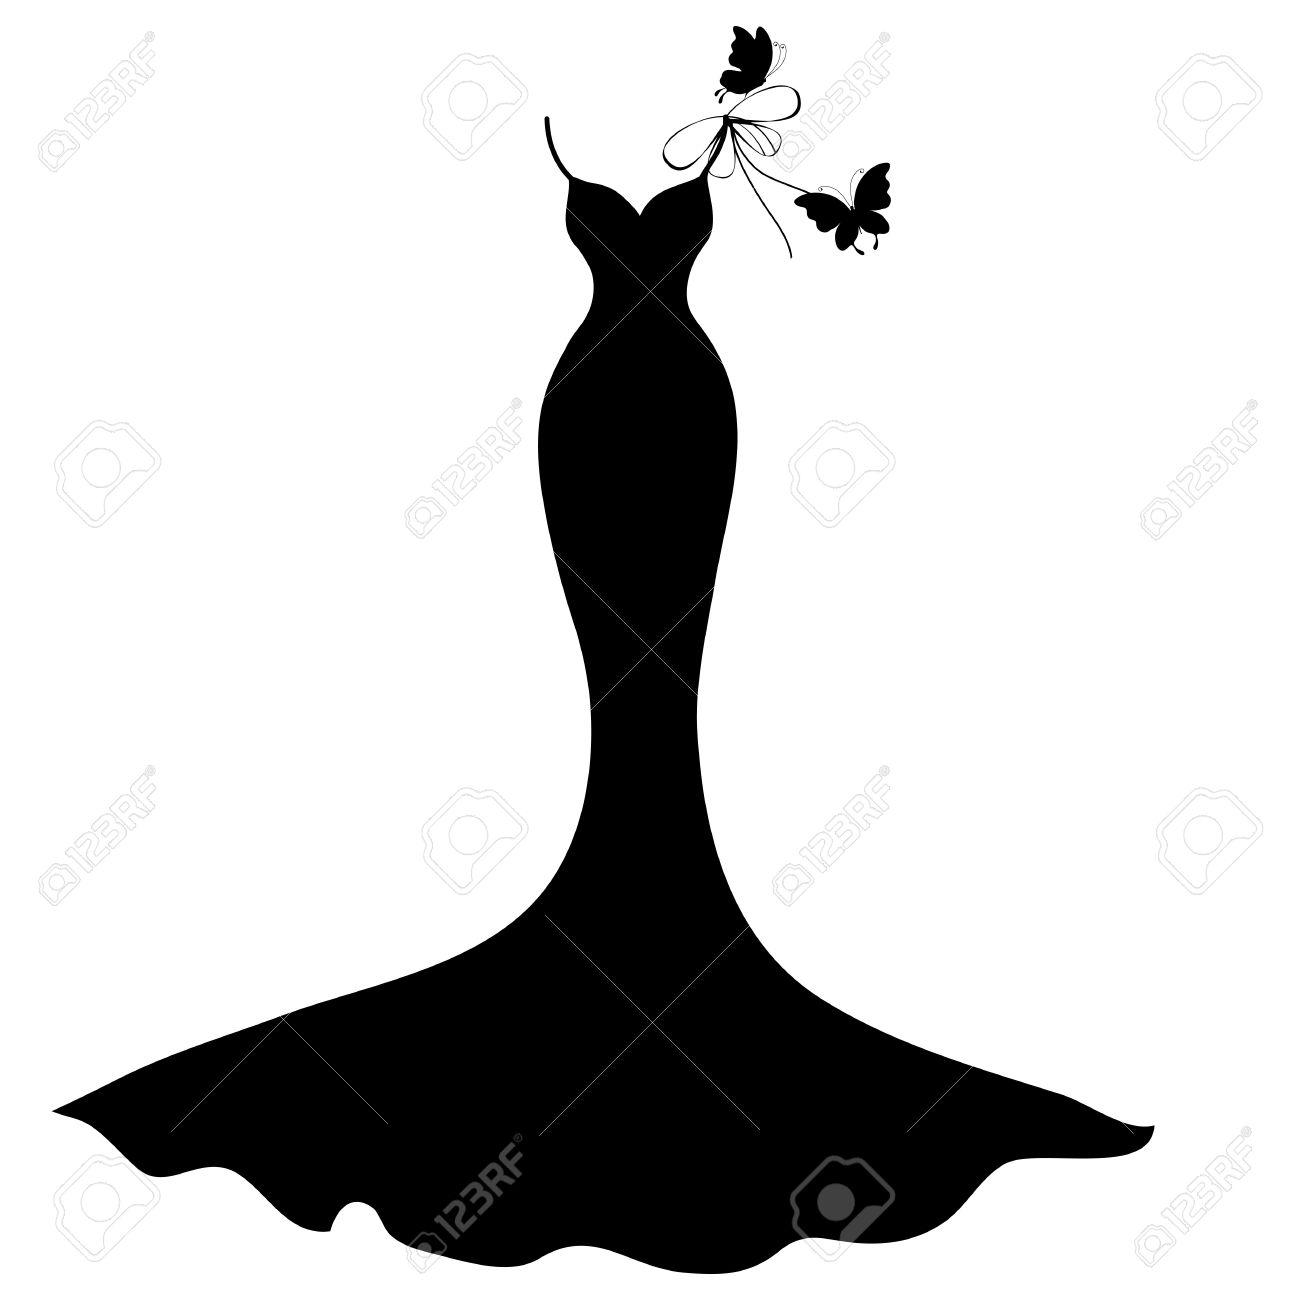 1300x1300 Fancy Letter H Clipart Delightful Hm Wedding Dress